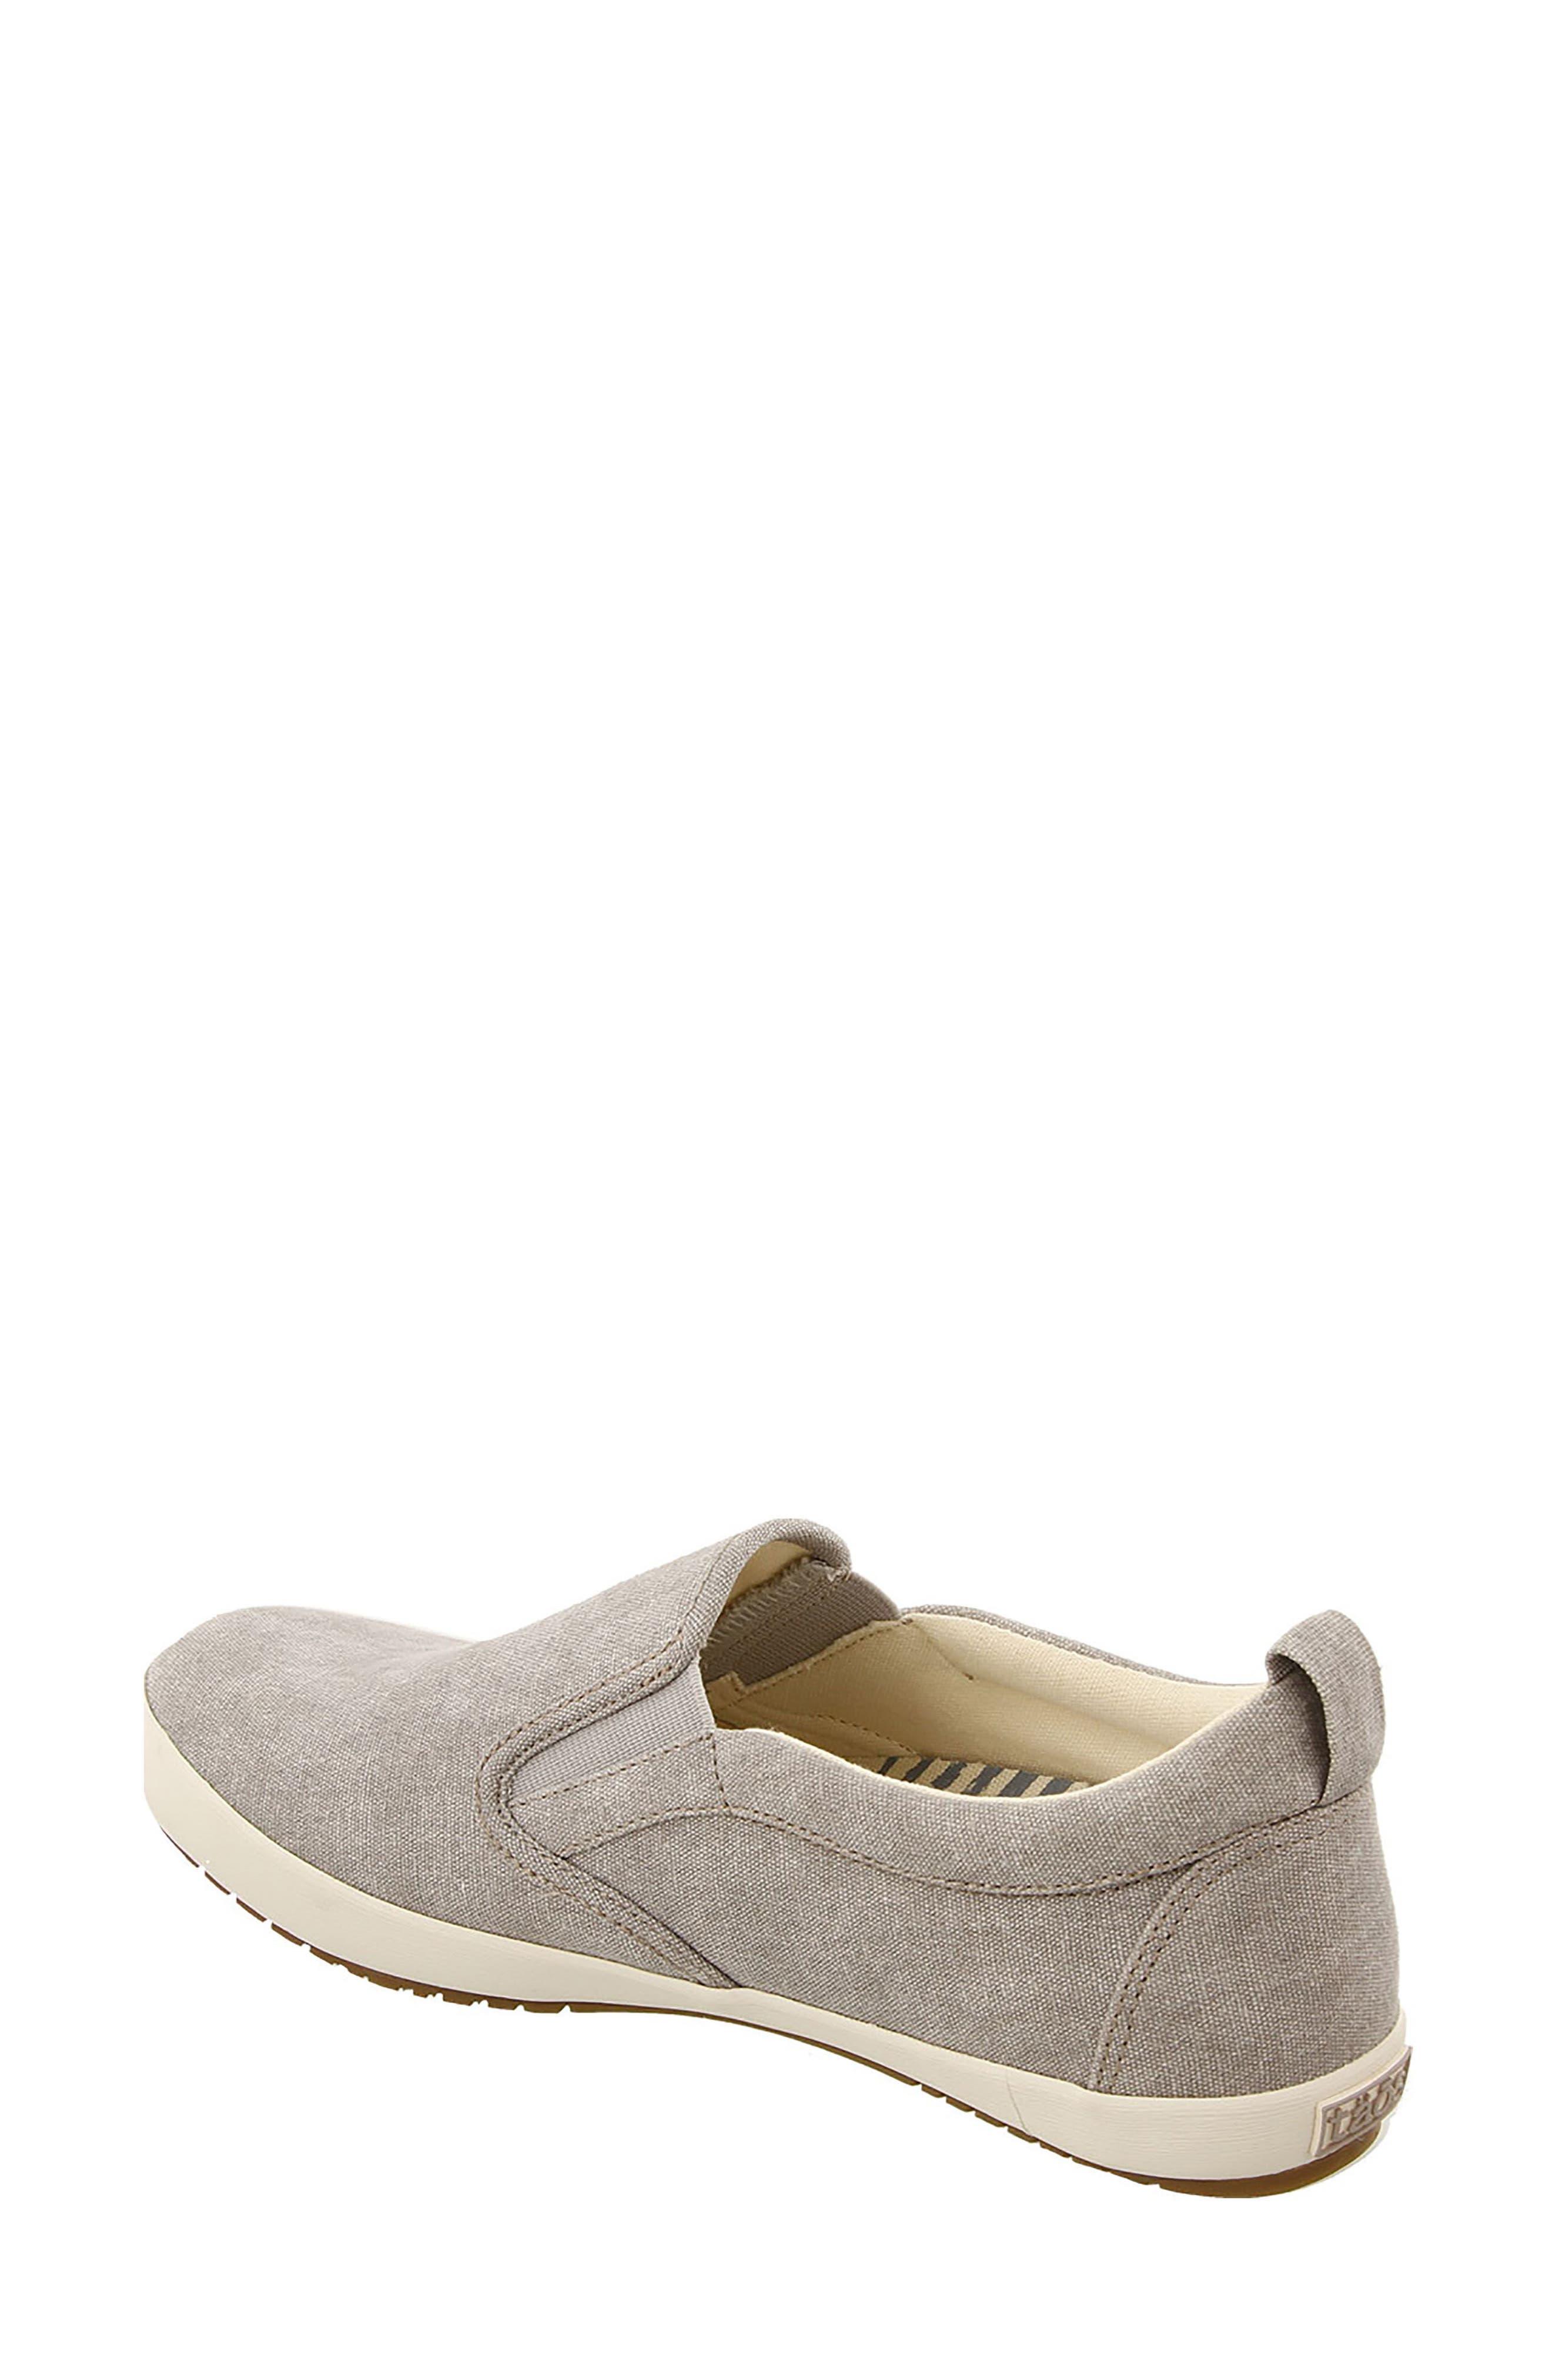 Alternate Image 2  - Taos Dandy Slip-On Sneaker (Women)